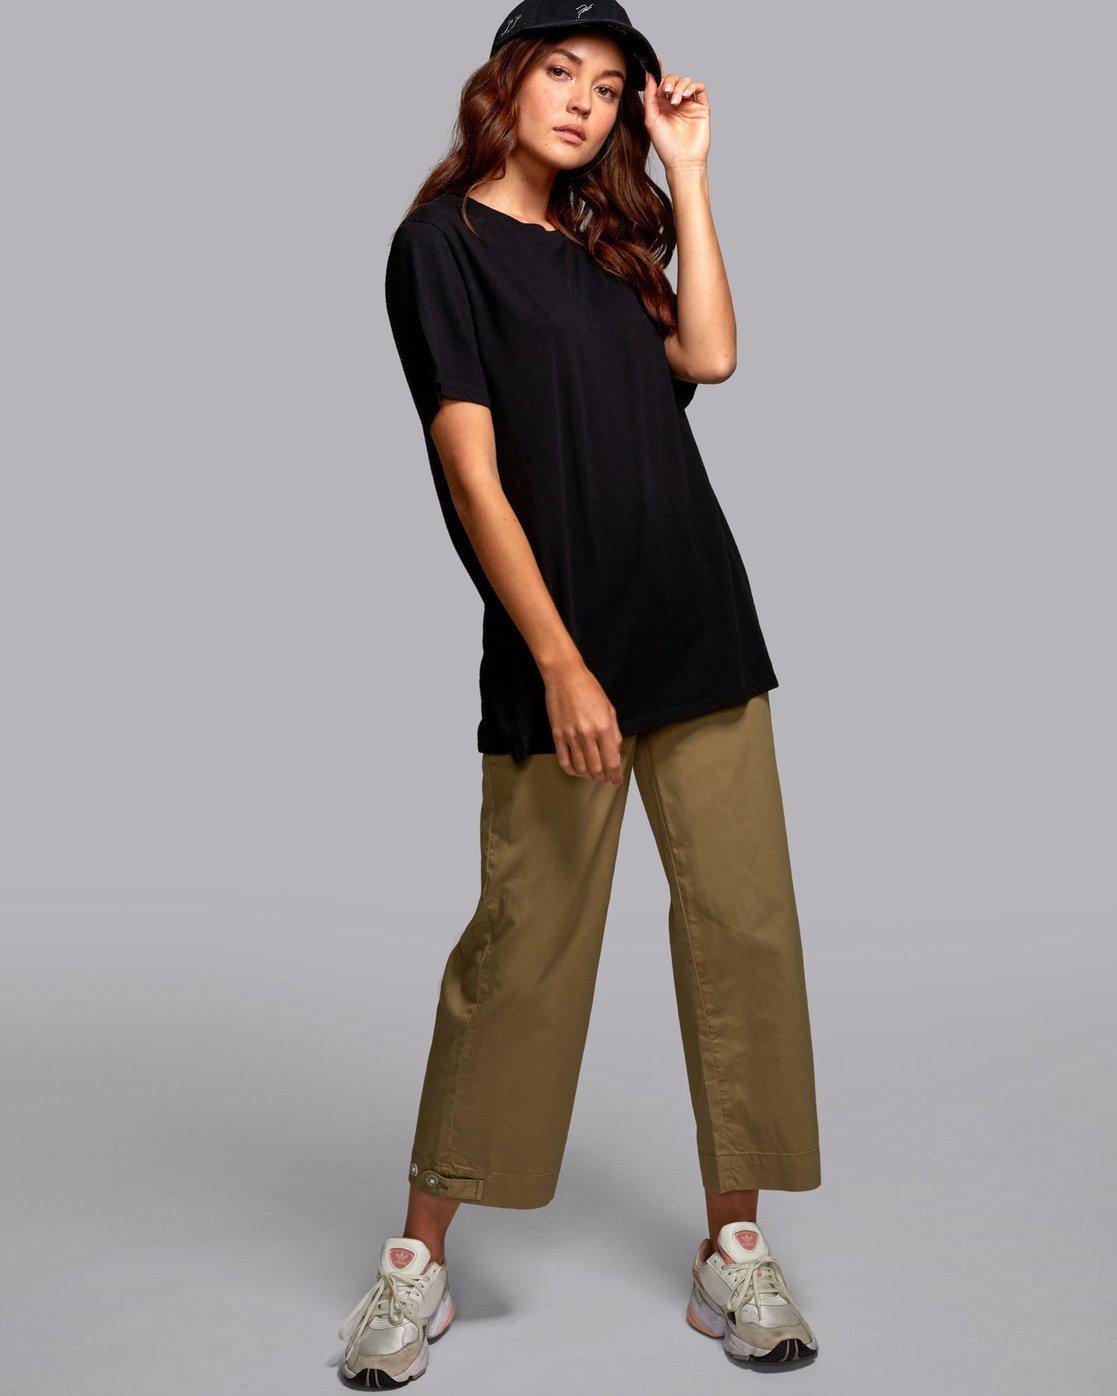 1 Johanna Olk Faces - Graphic T-Shirt for Graphic T-Shirt Black S3SSRCRVP0 RVCA